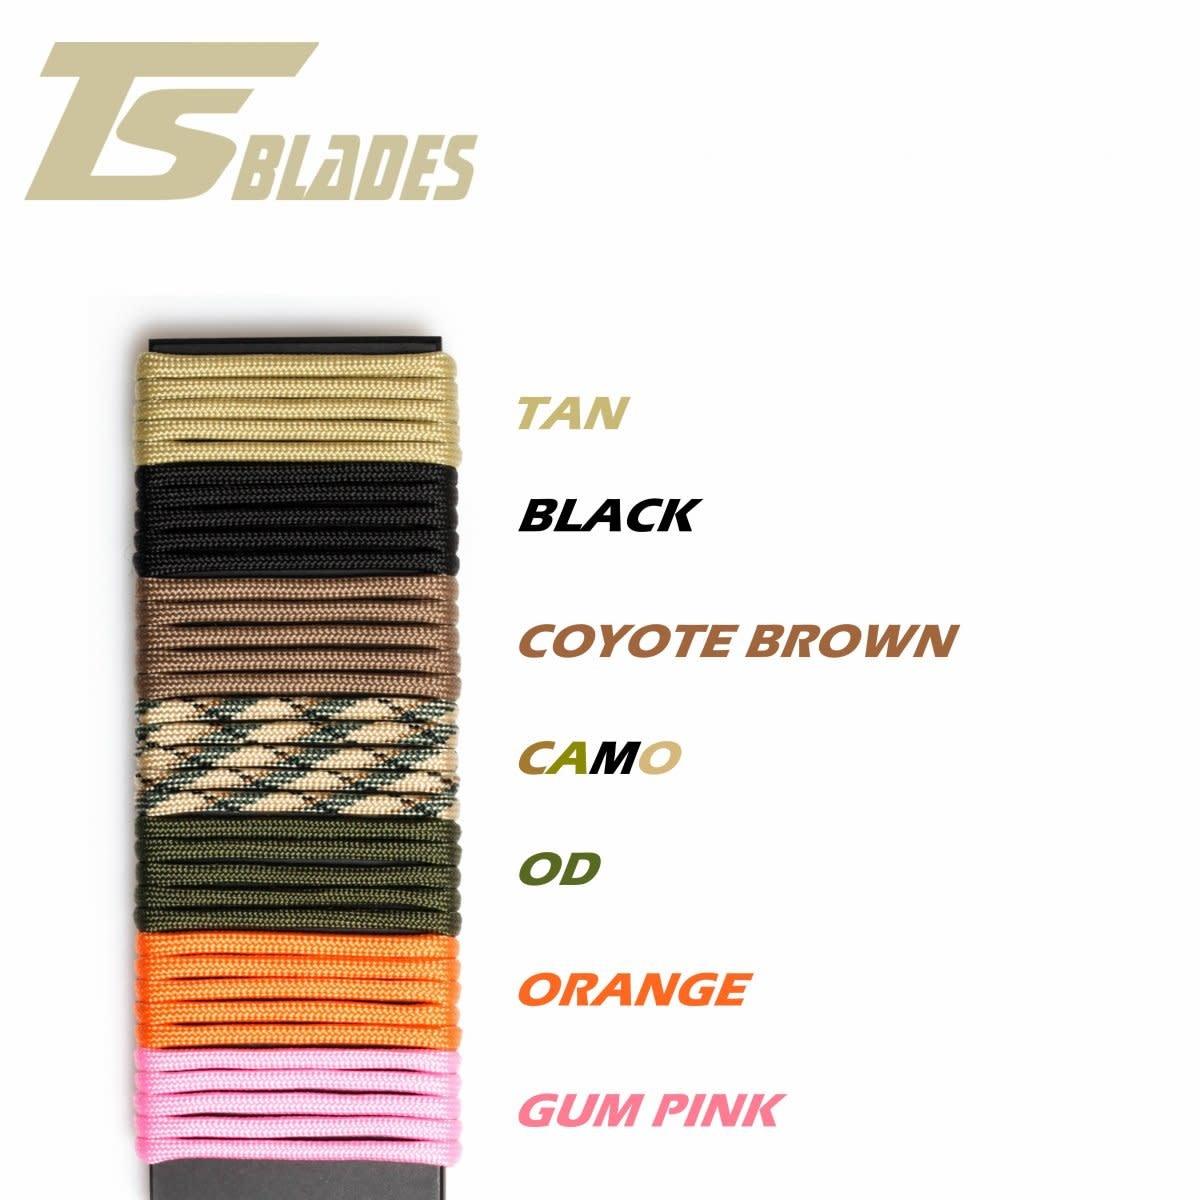 TS Blades TS Blade TS-CHACAL